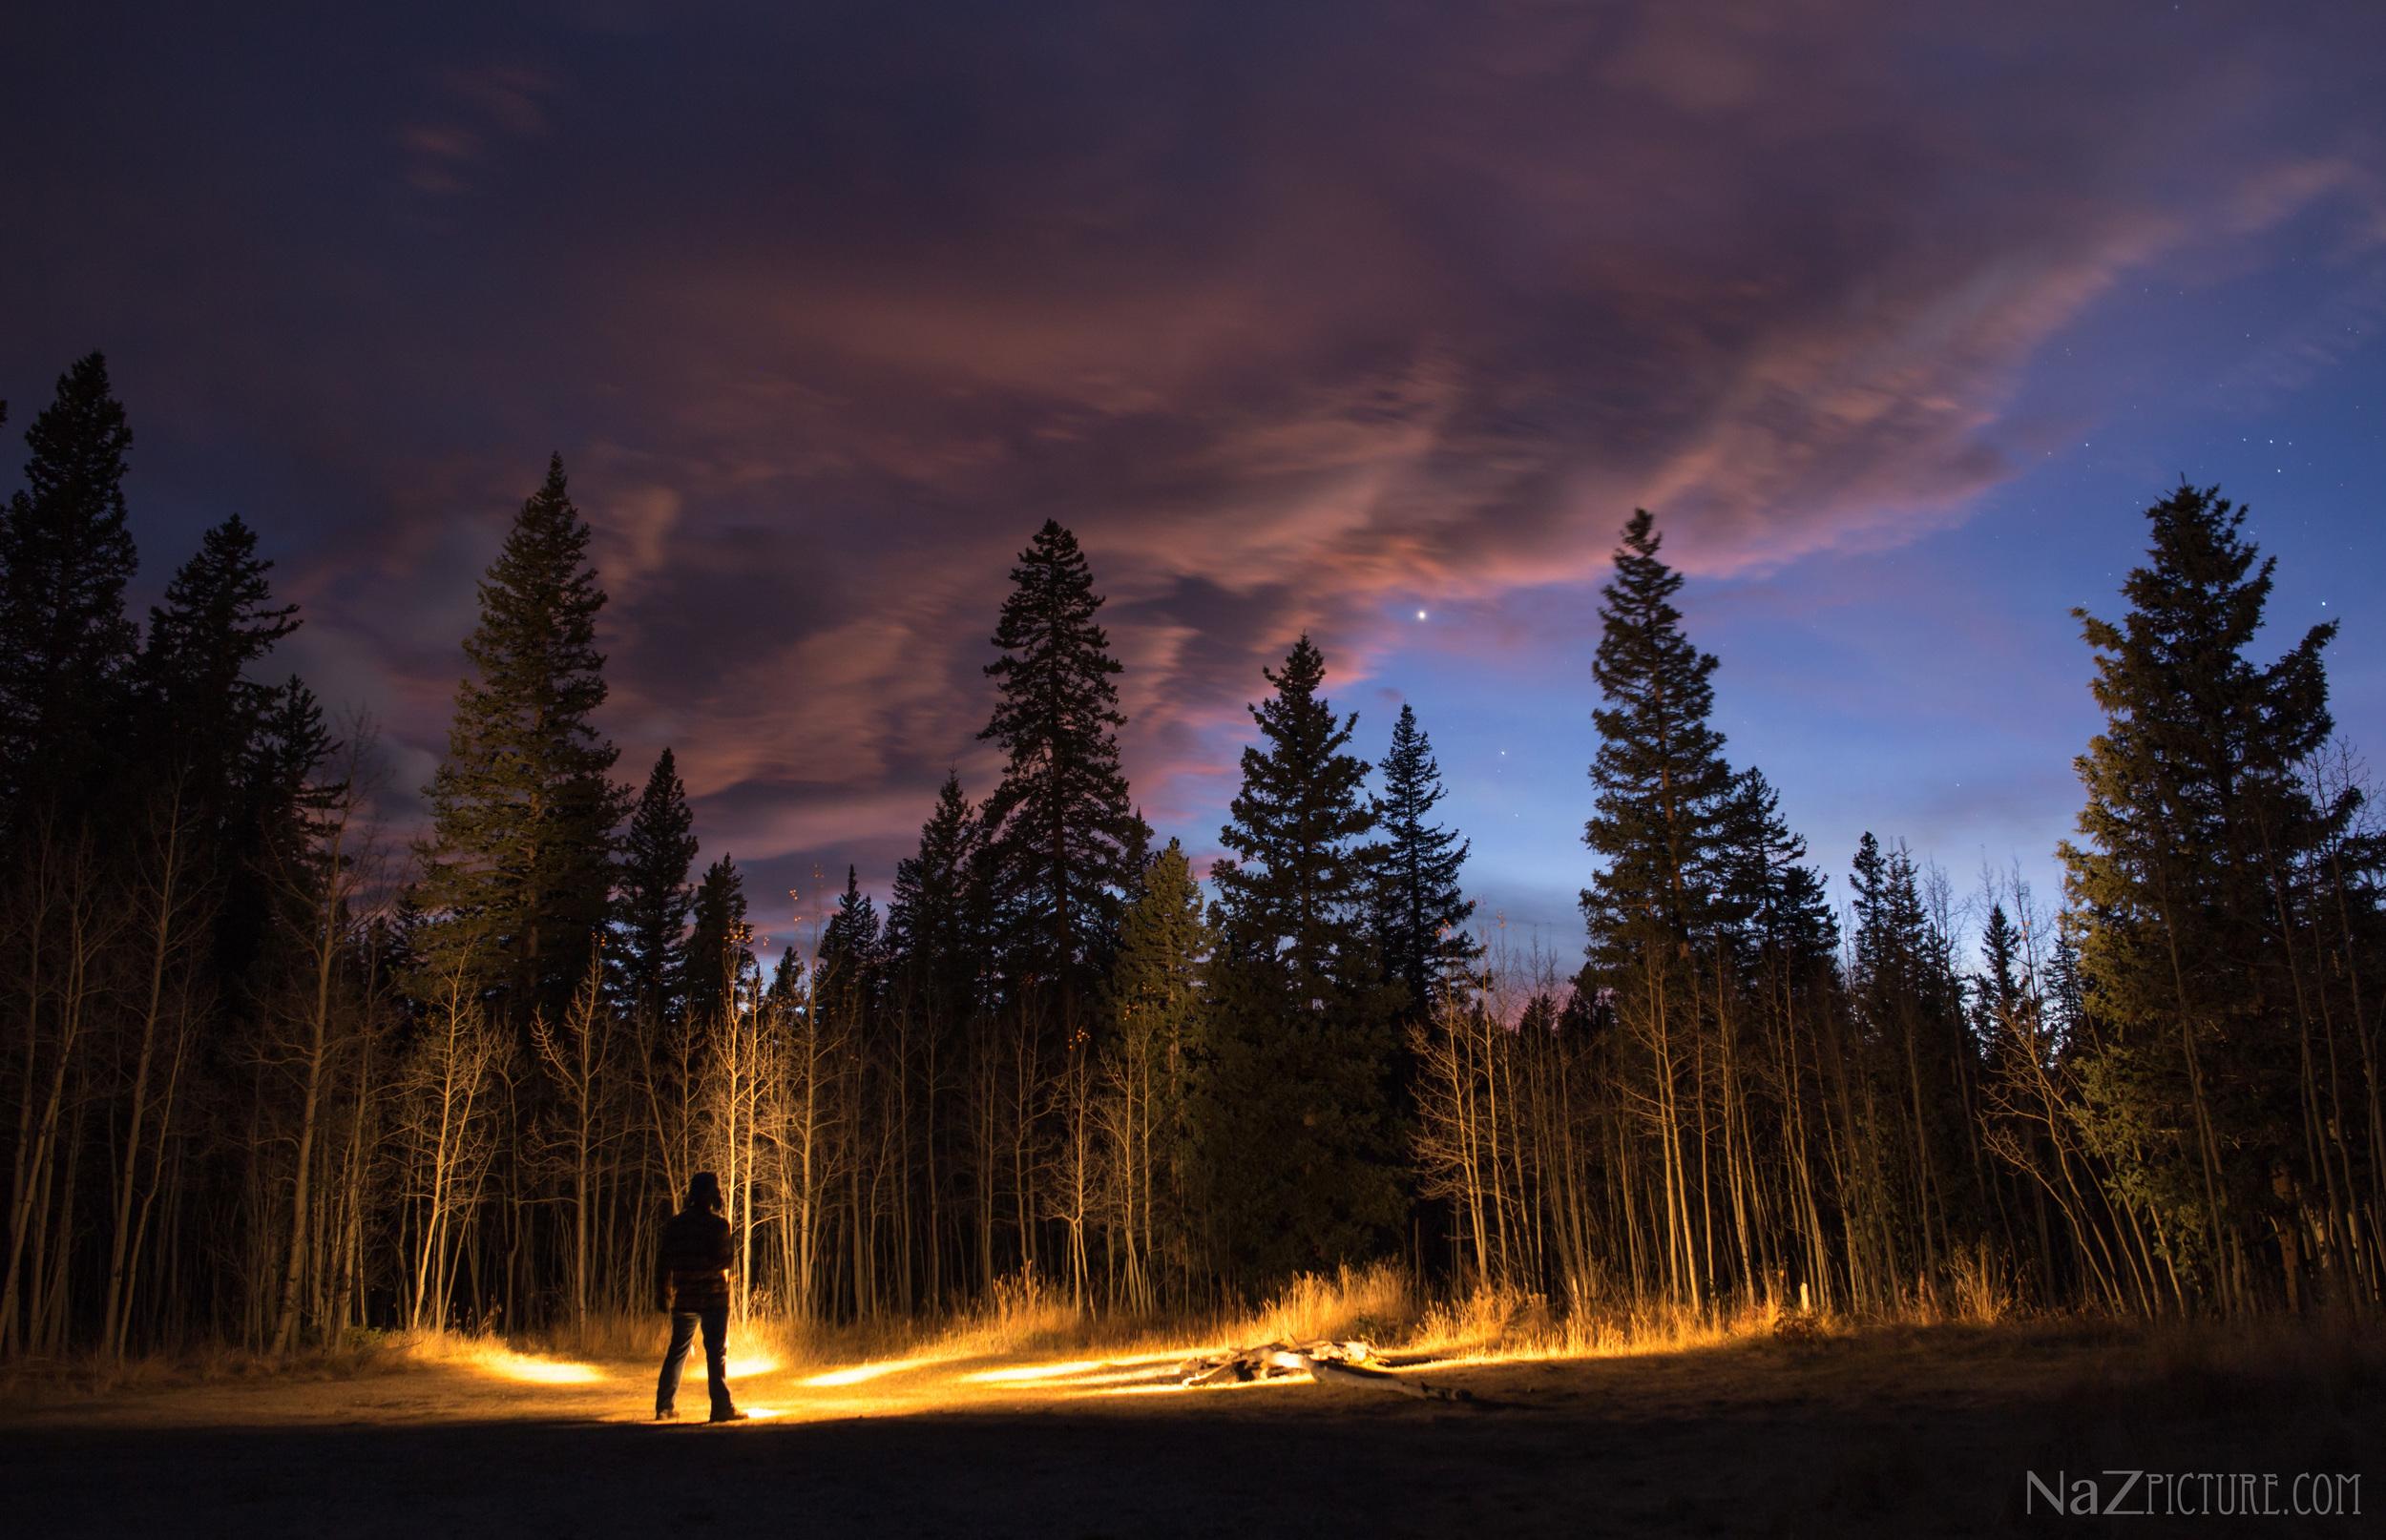 Last remaining light slips away at Kenosha Pass, Colorado